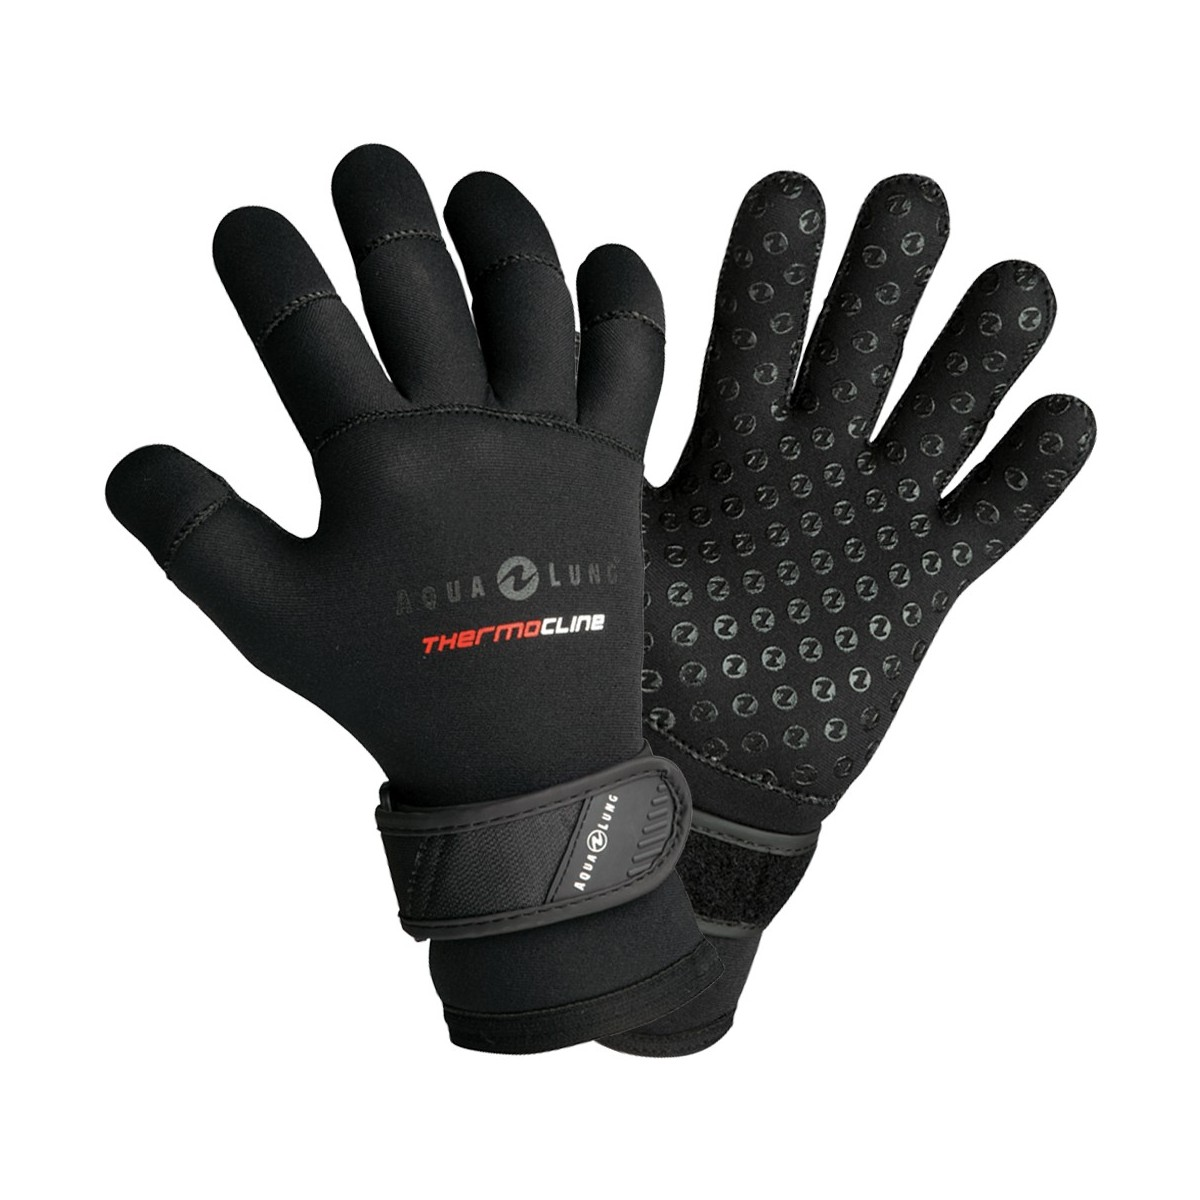 Aqua Lung Men's 5mm Thermocline Glove